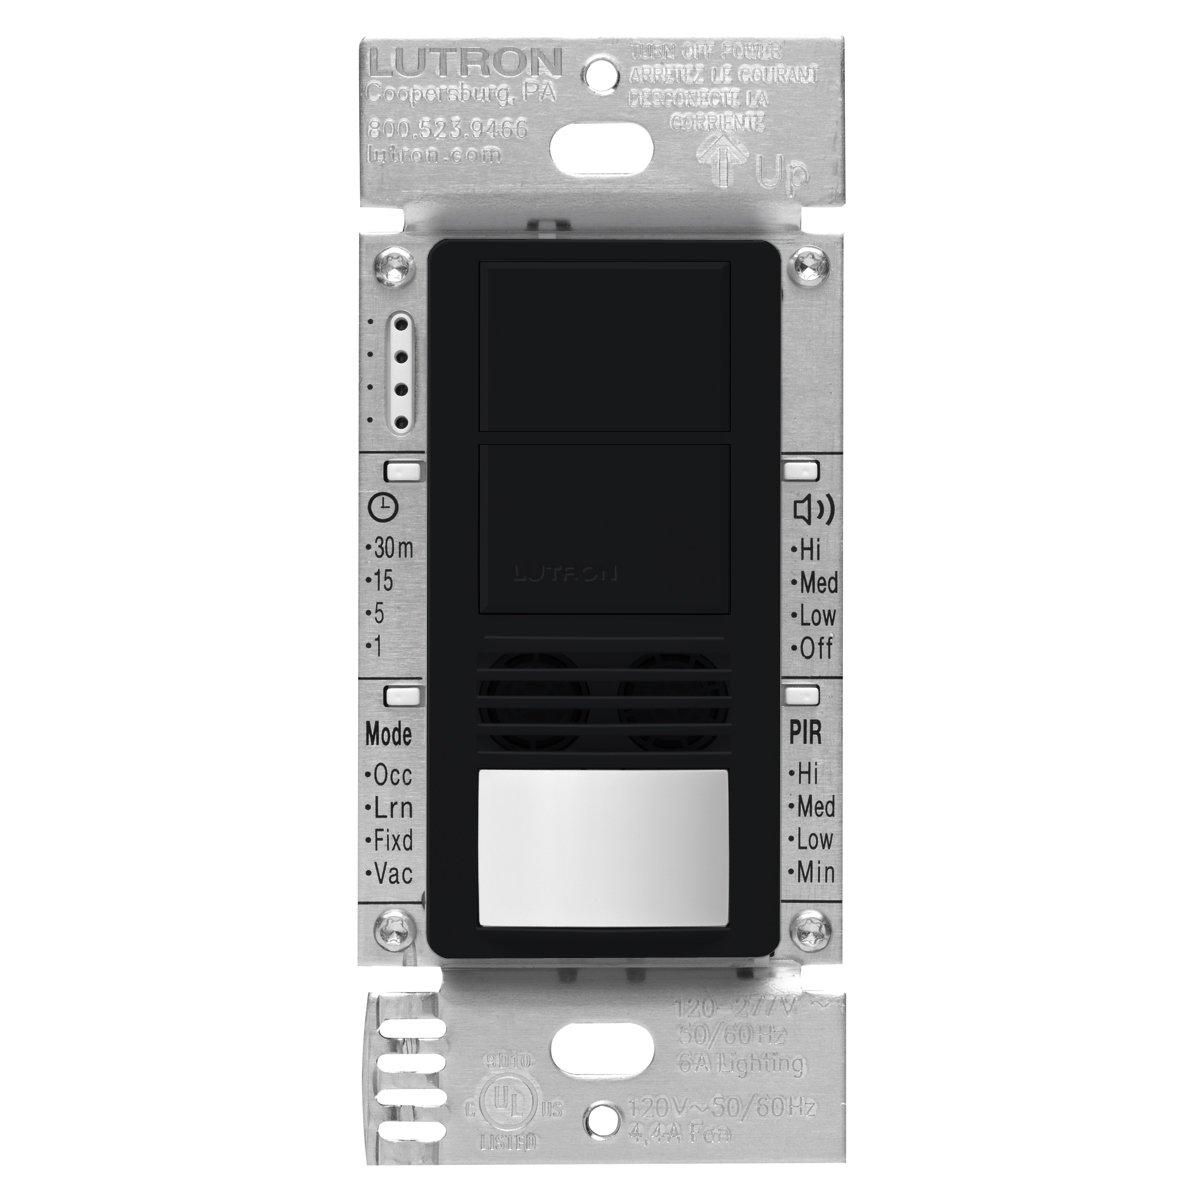 Lutron MS-A202-BL Maestro Dual Tech Dual Circuit Occupancy Sensor Switch, no neutral required, 6 Amp Single-Pole, Black